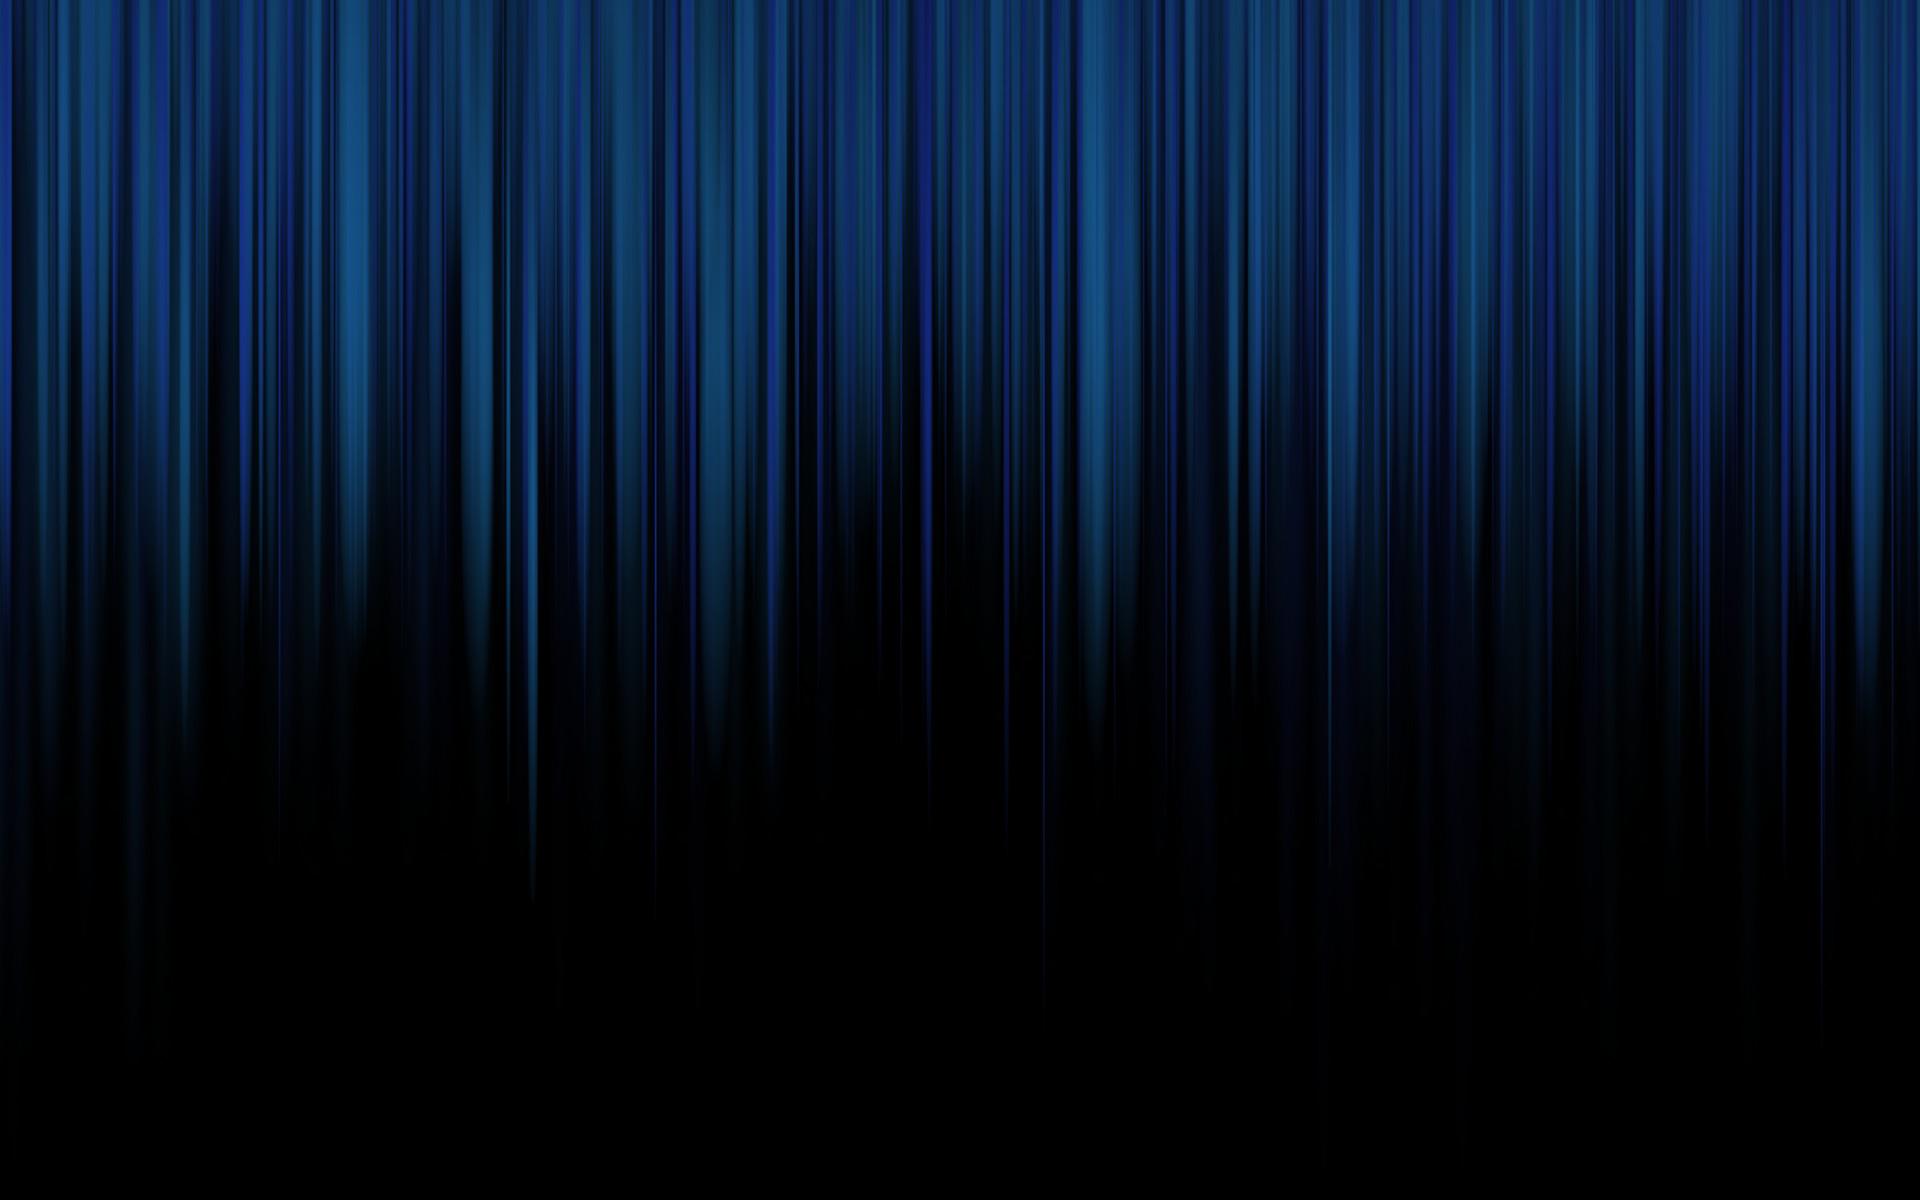 Free Dark Blue Wallpaper High Quality download.